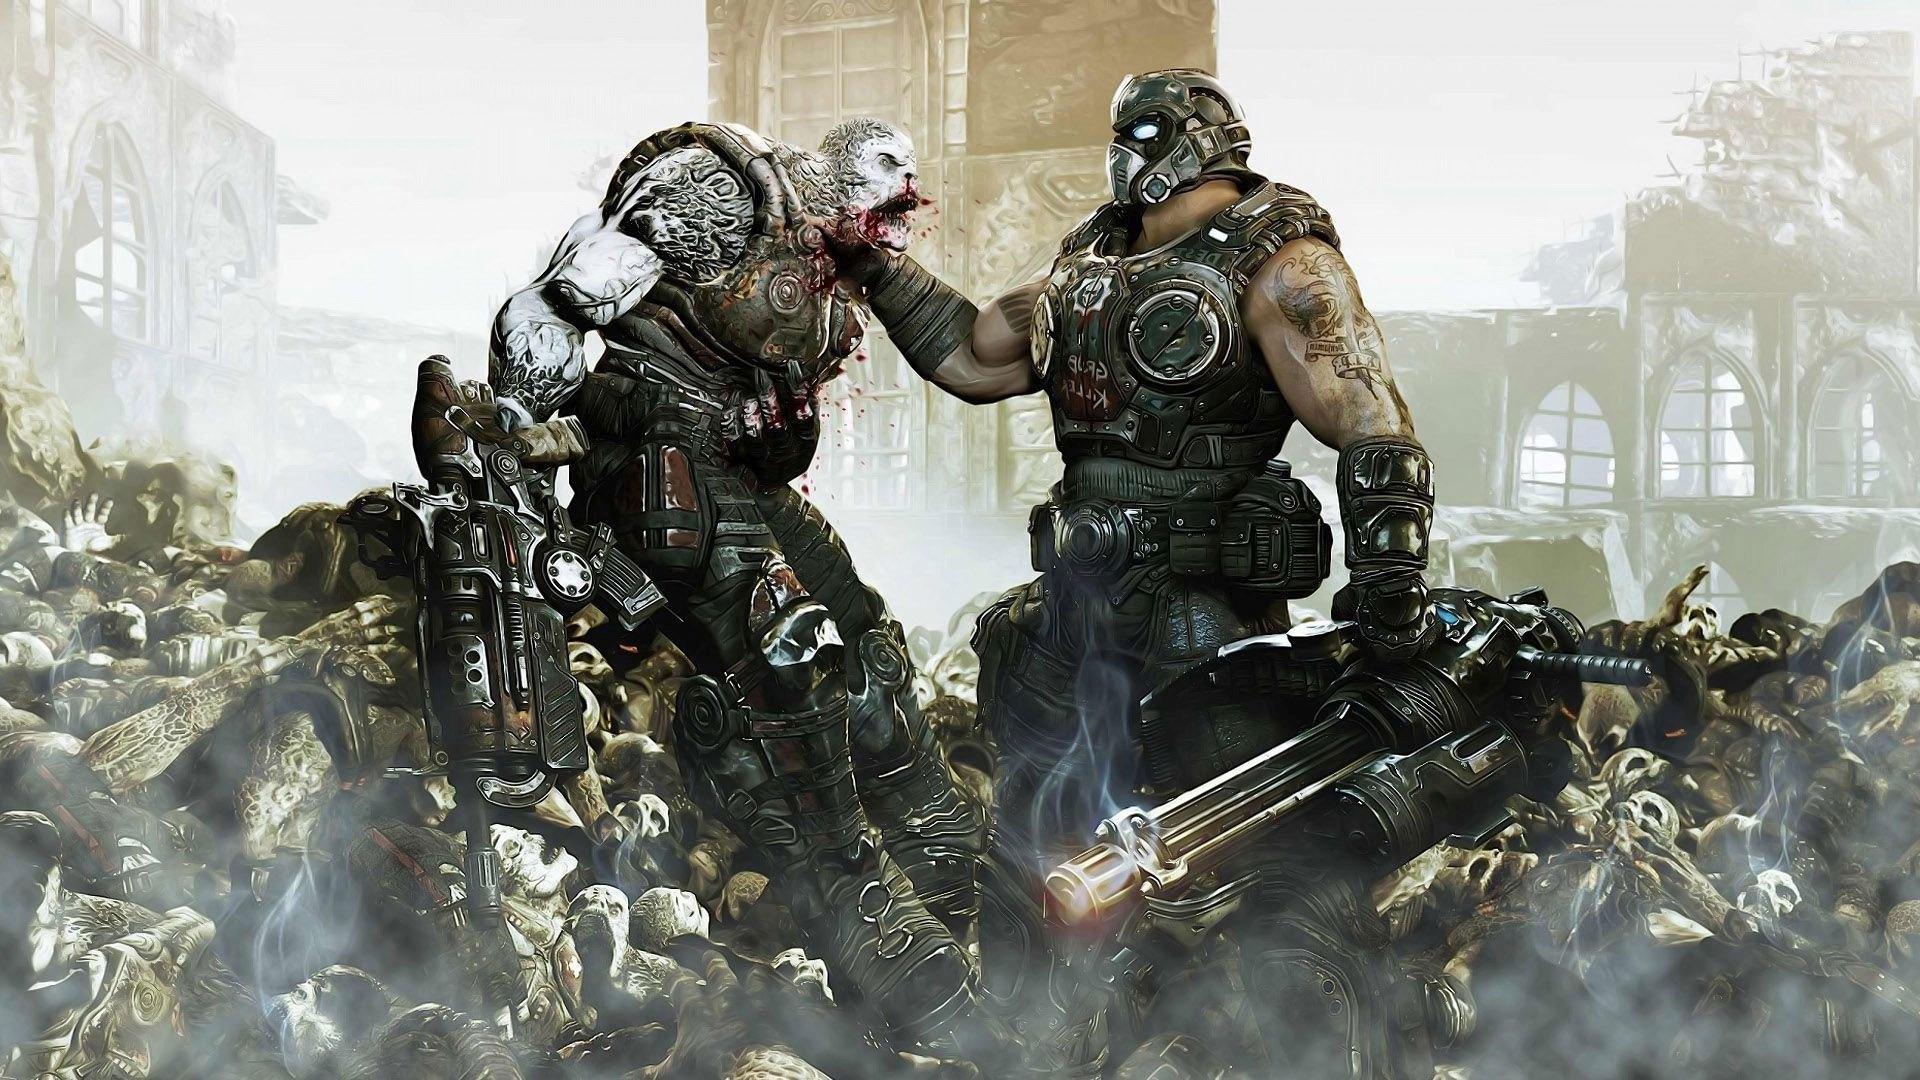 Gears Of War 4 2016 Video Game 4k Hd Desktop Wallpaper For: 2016 Gears Of War 4 HD, HD Games, 4k Wallpapers, Images